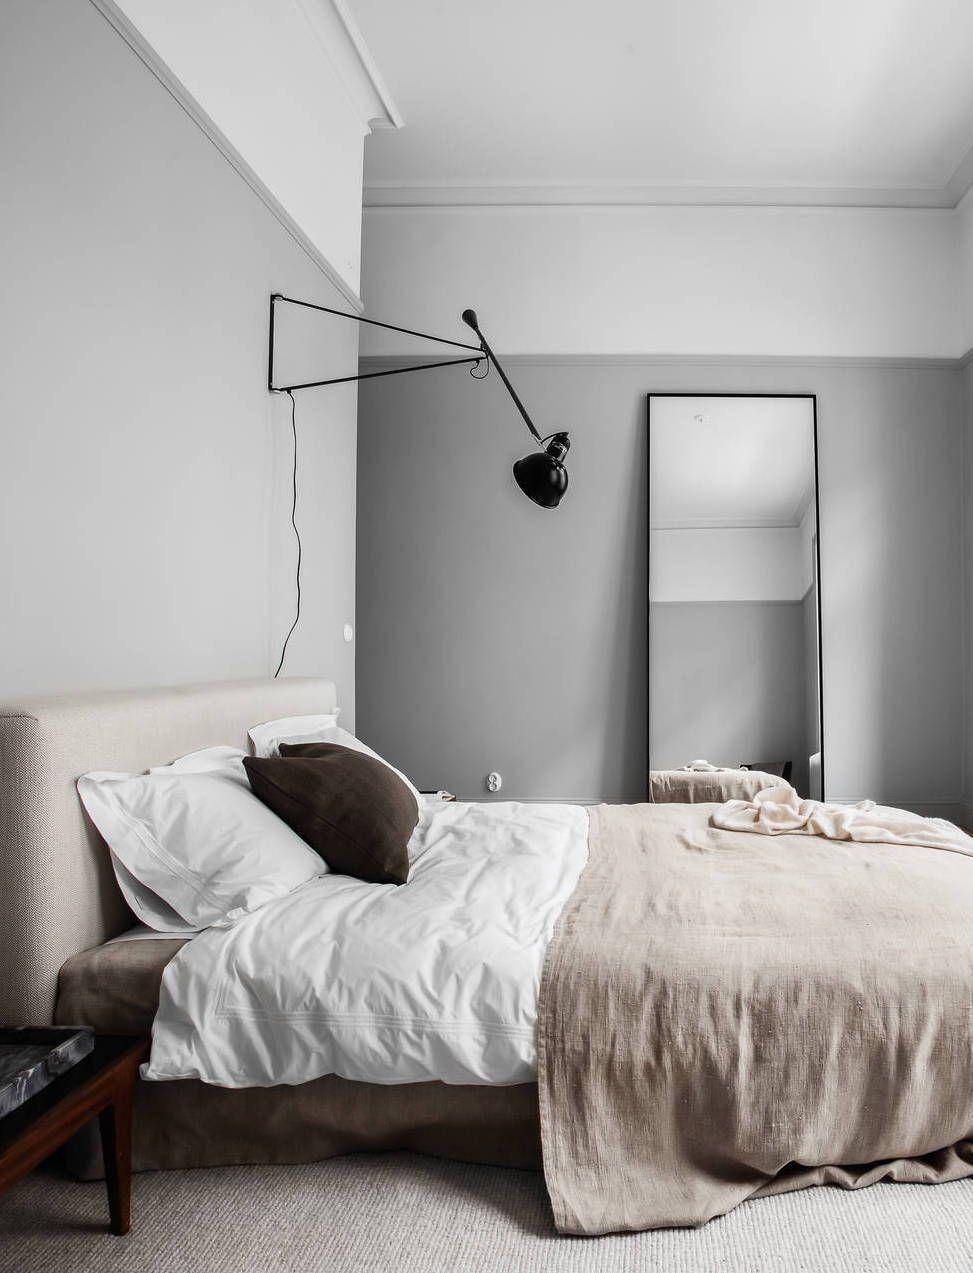 warm home in grey apartment pinterest bedroom bedroom decor rh pinterest com